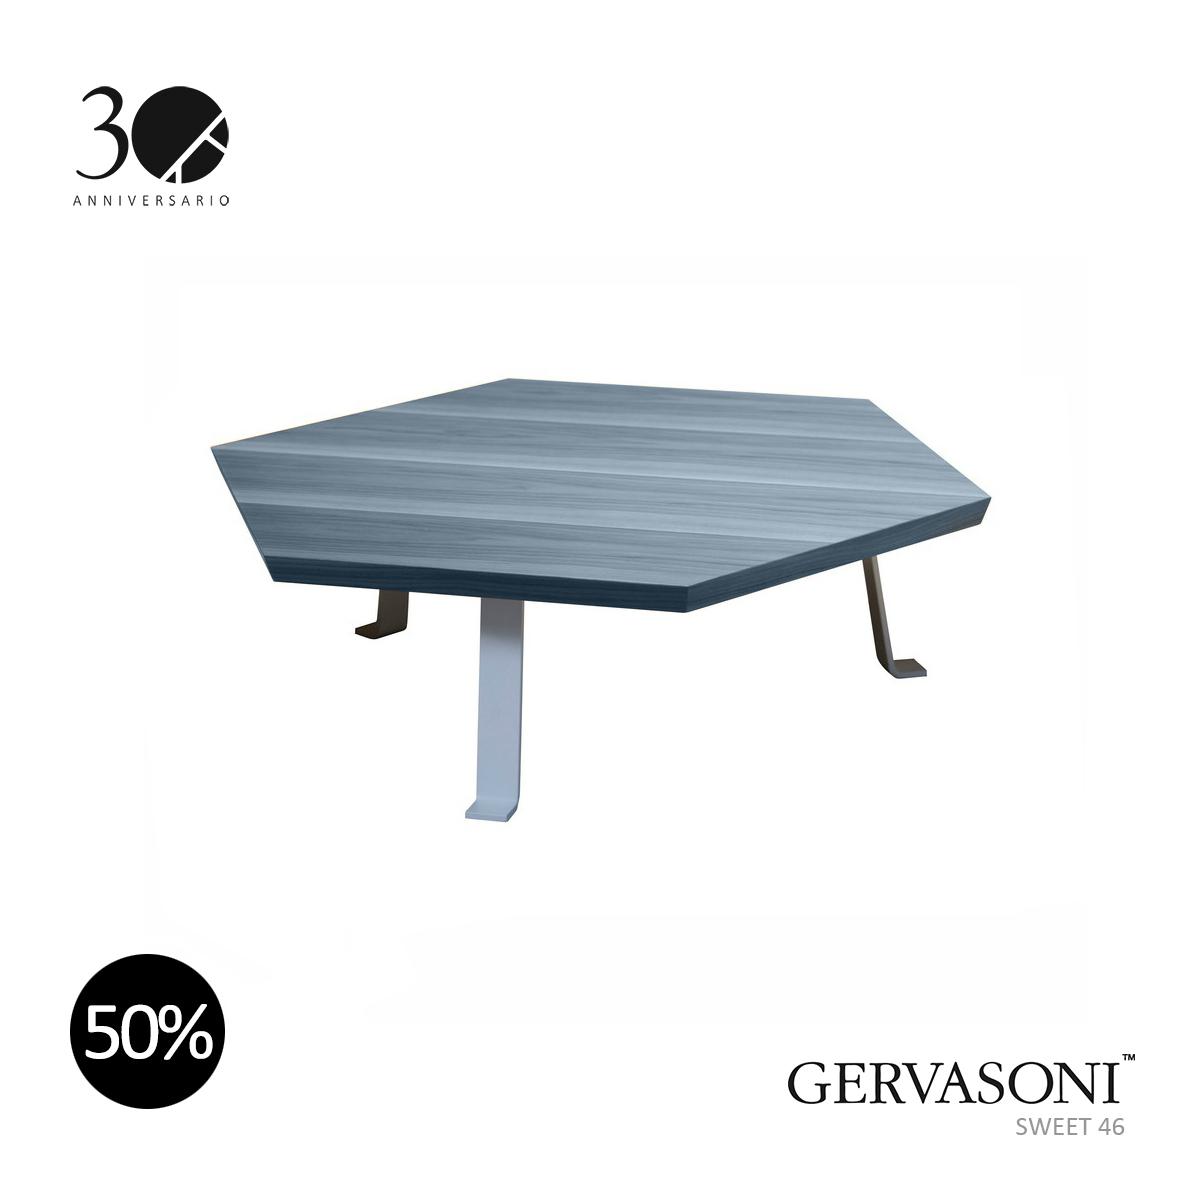 GERVASONI - SWEET 46